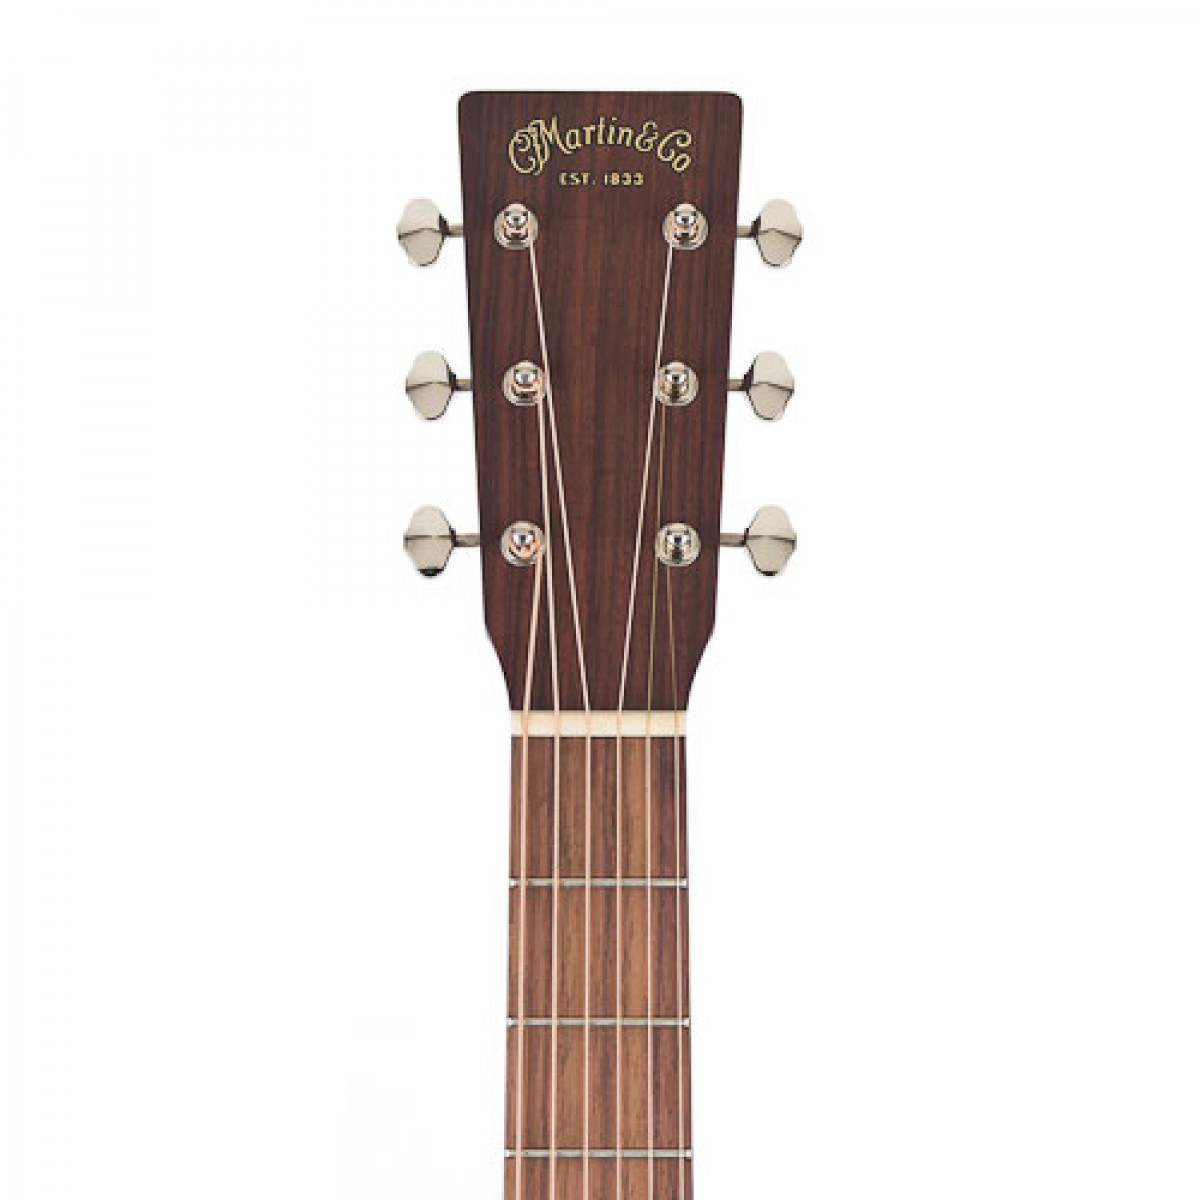 Linkshändergitarren